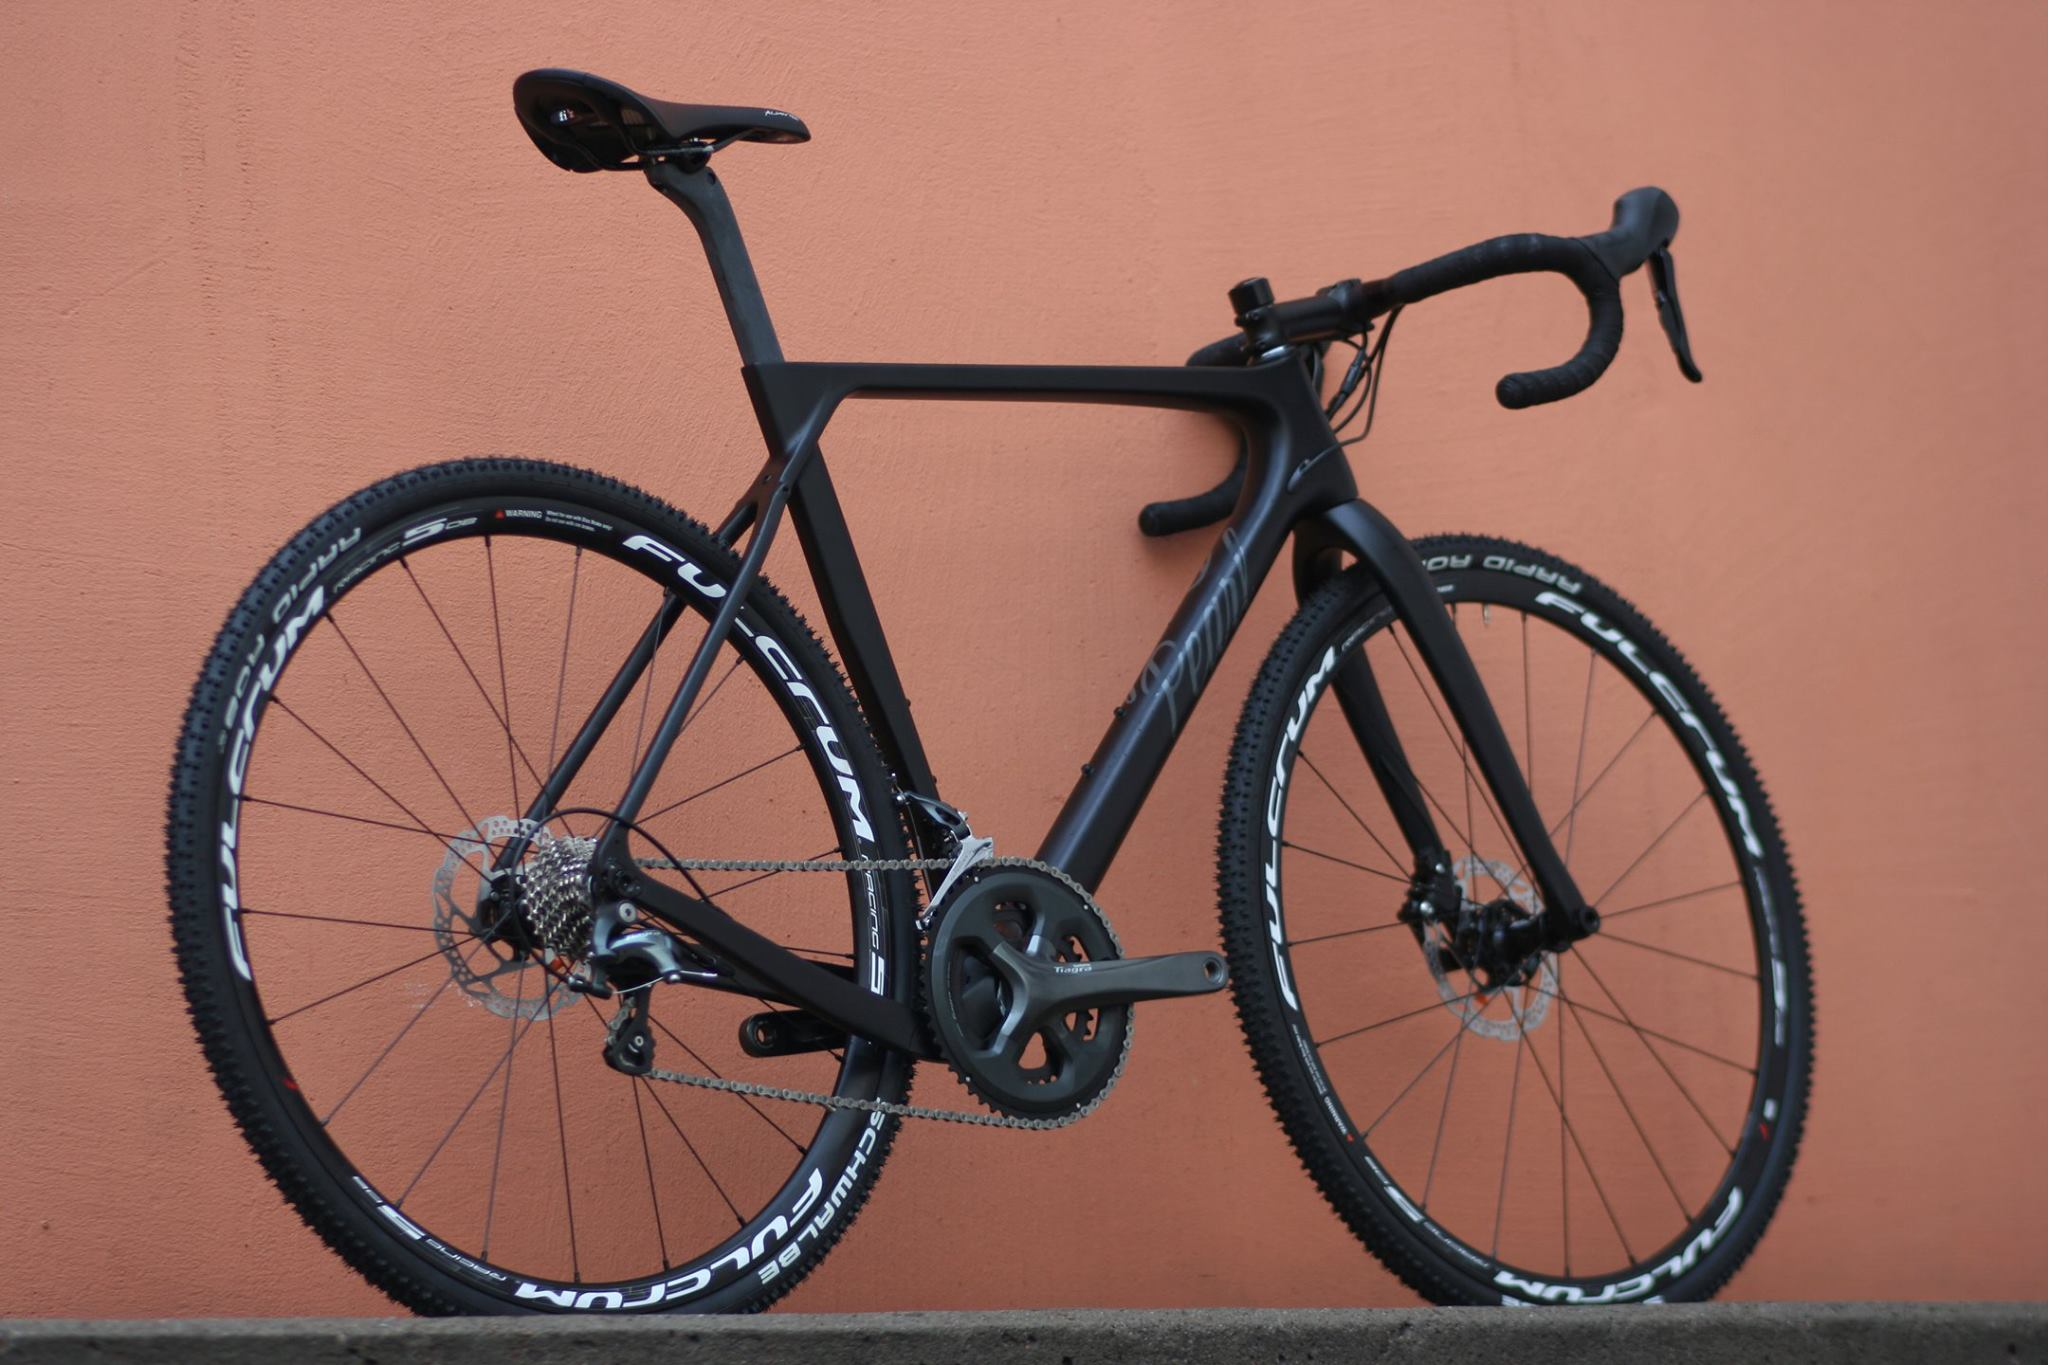 pearl cycles carbon gravel bike. Black Bedroom Furniture Sets. Home Design Ideas